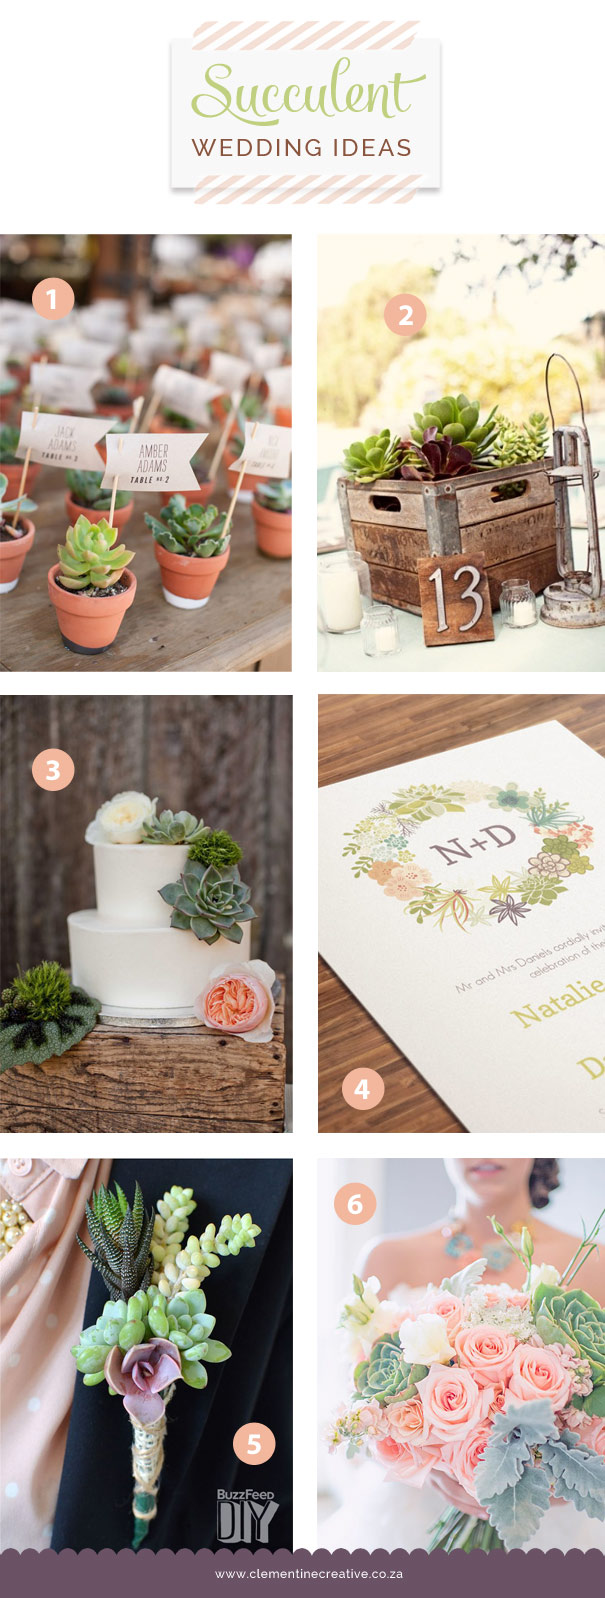 Diy Succulent Wedding Ideas